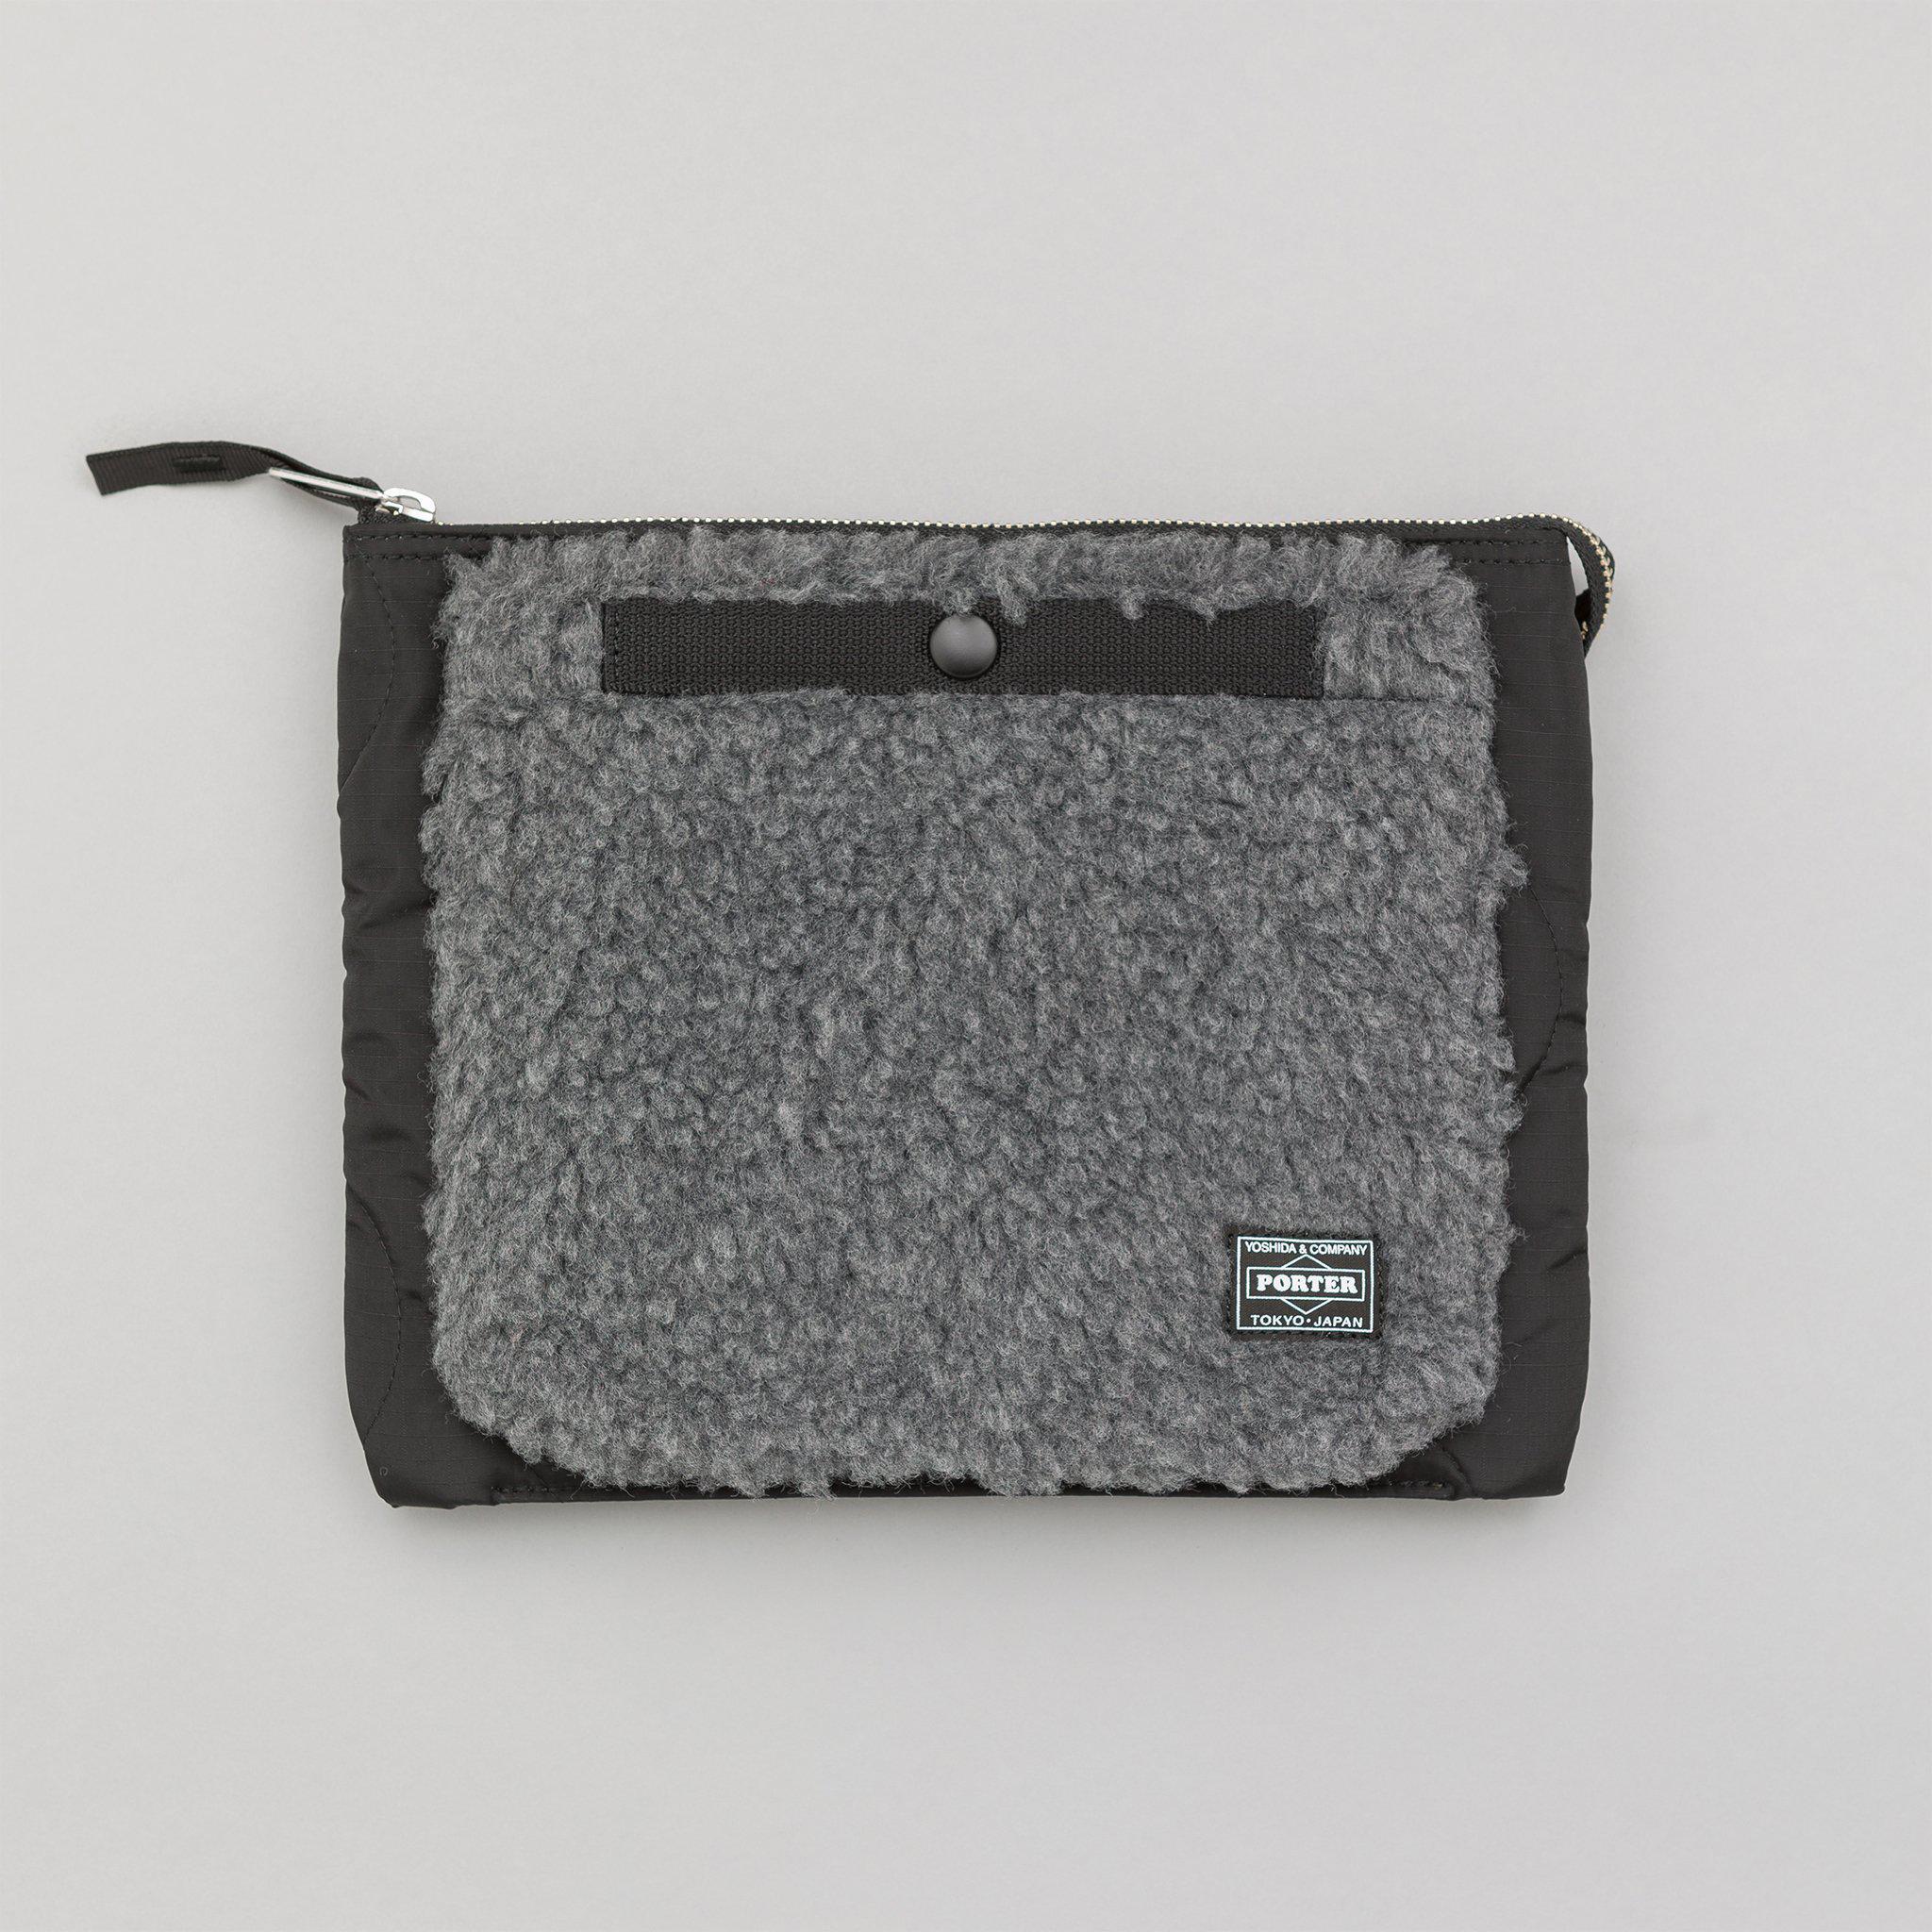 bbc044bc84ba Head Porter - Kerry Shoulder Bag In Black for Men - Lyst. View fullscreen